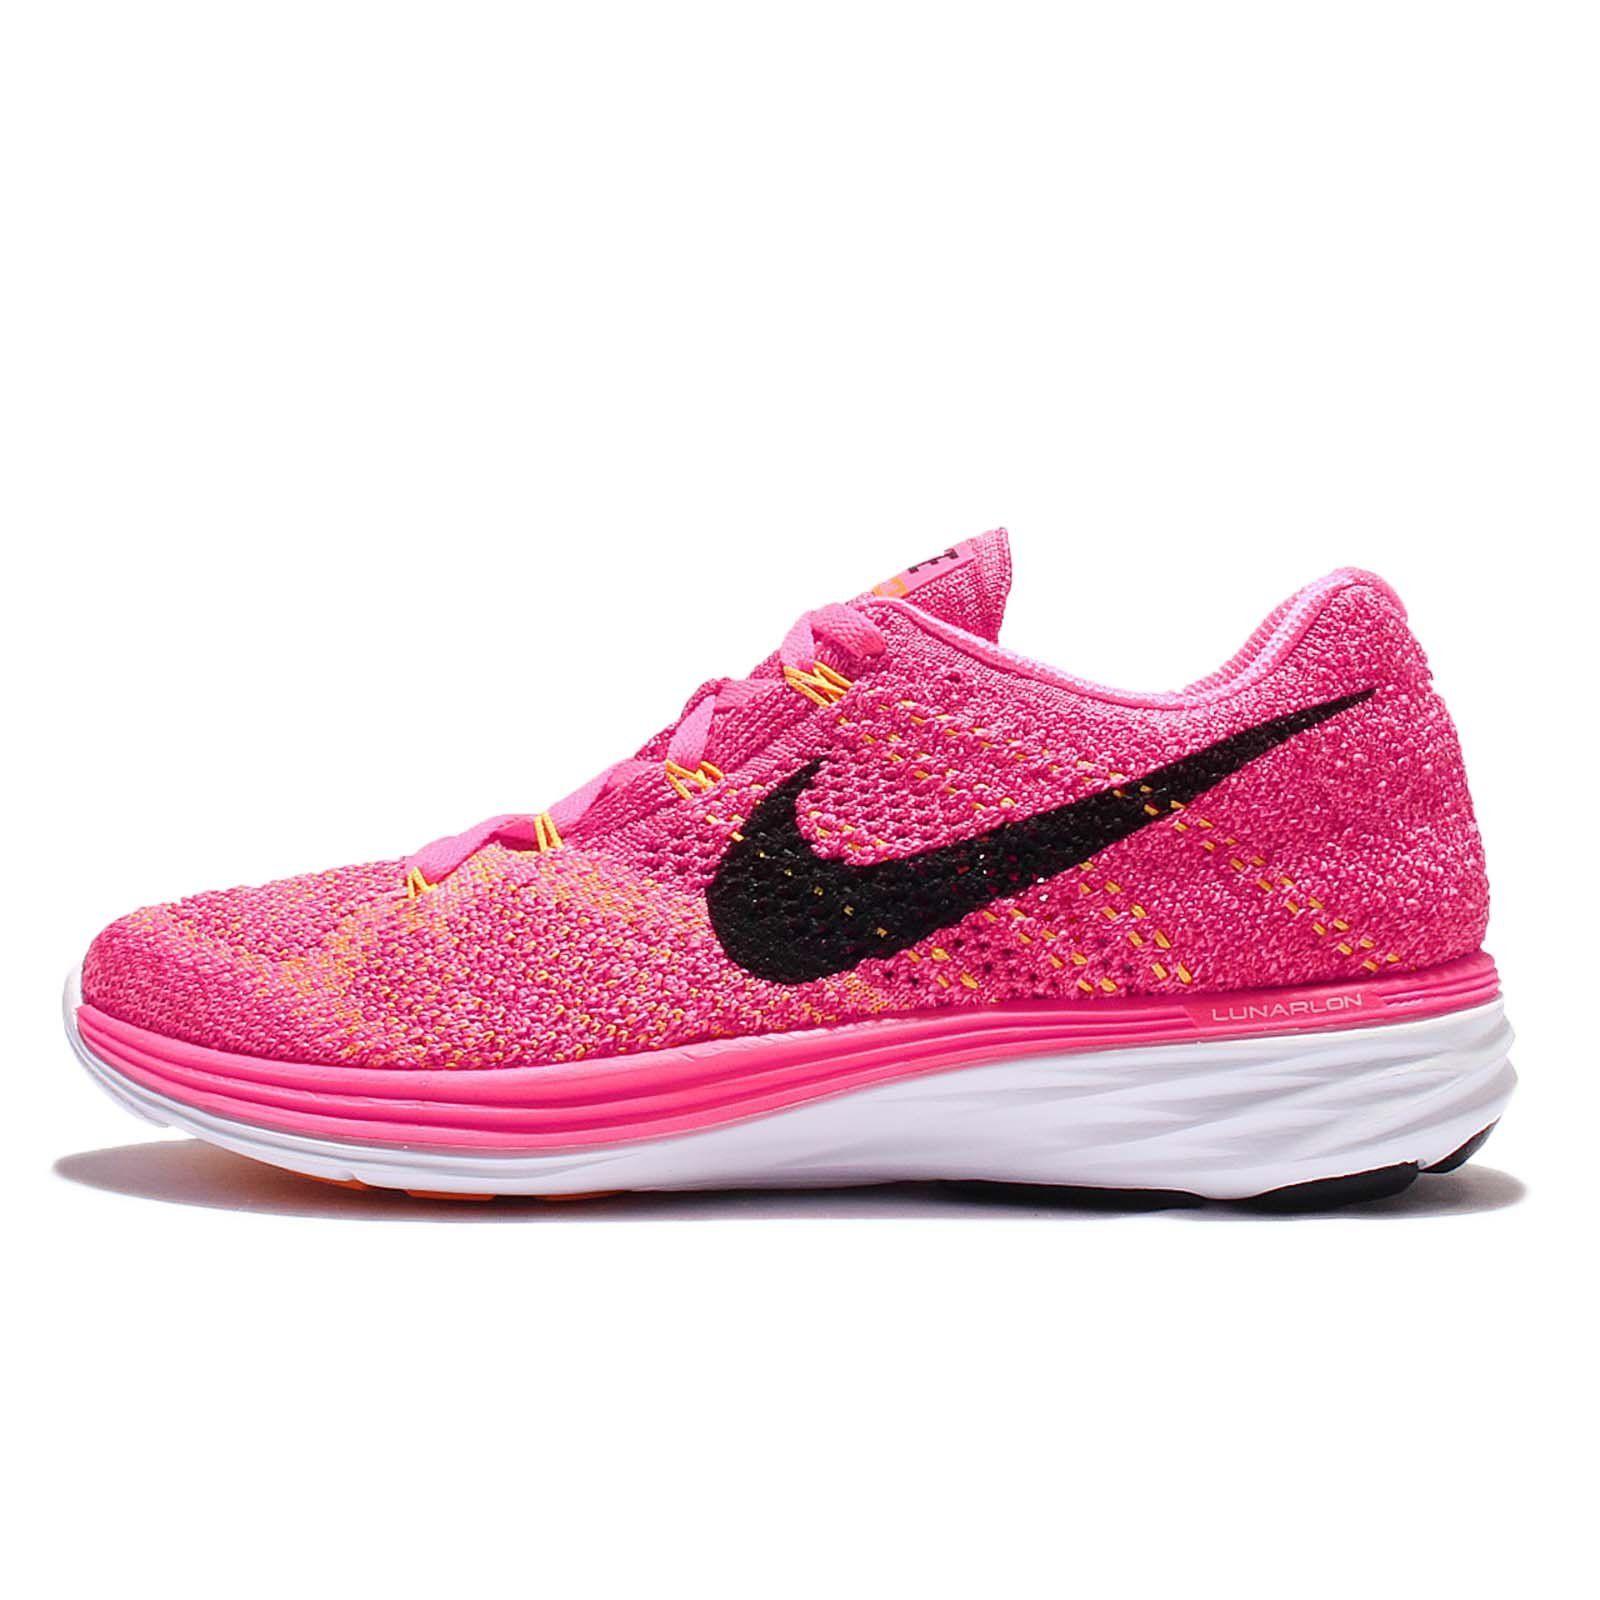 991bdd7e30d5 Nike Women s Flyknit Lunar3 Running Shoe Pink Blast Womens Size 9 US. Model  Number  698182603. Gender  womens. Color  PINK BLAST BLACK-FIREBERRY-LASER  ...